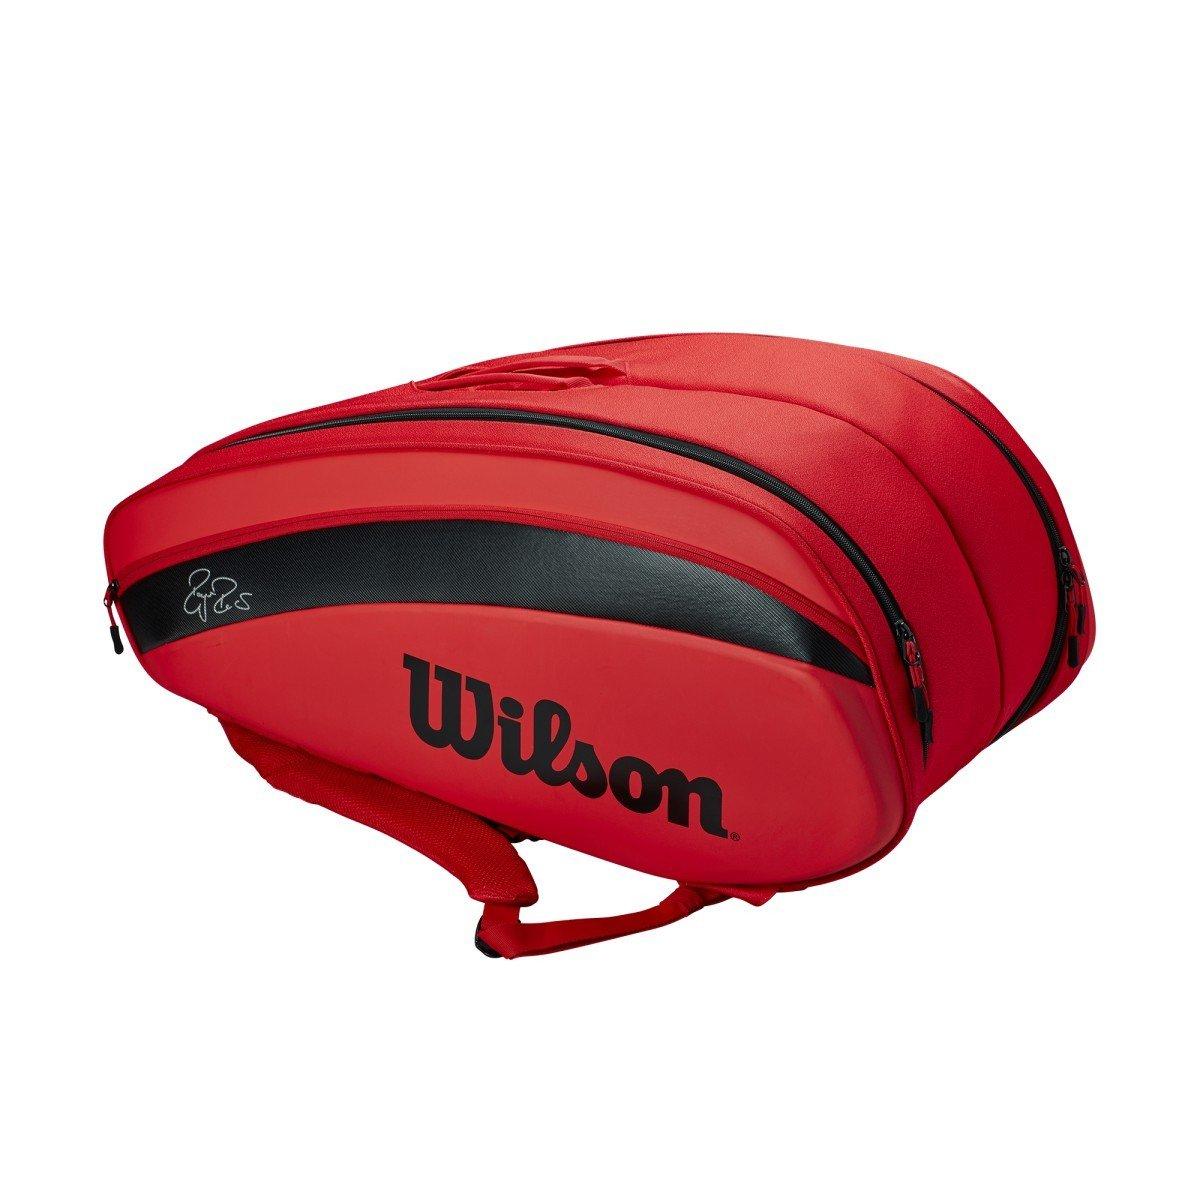 Wilson Tennis Bag – Roger Federer DNA 12-Pack